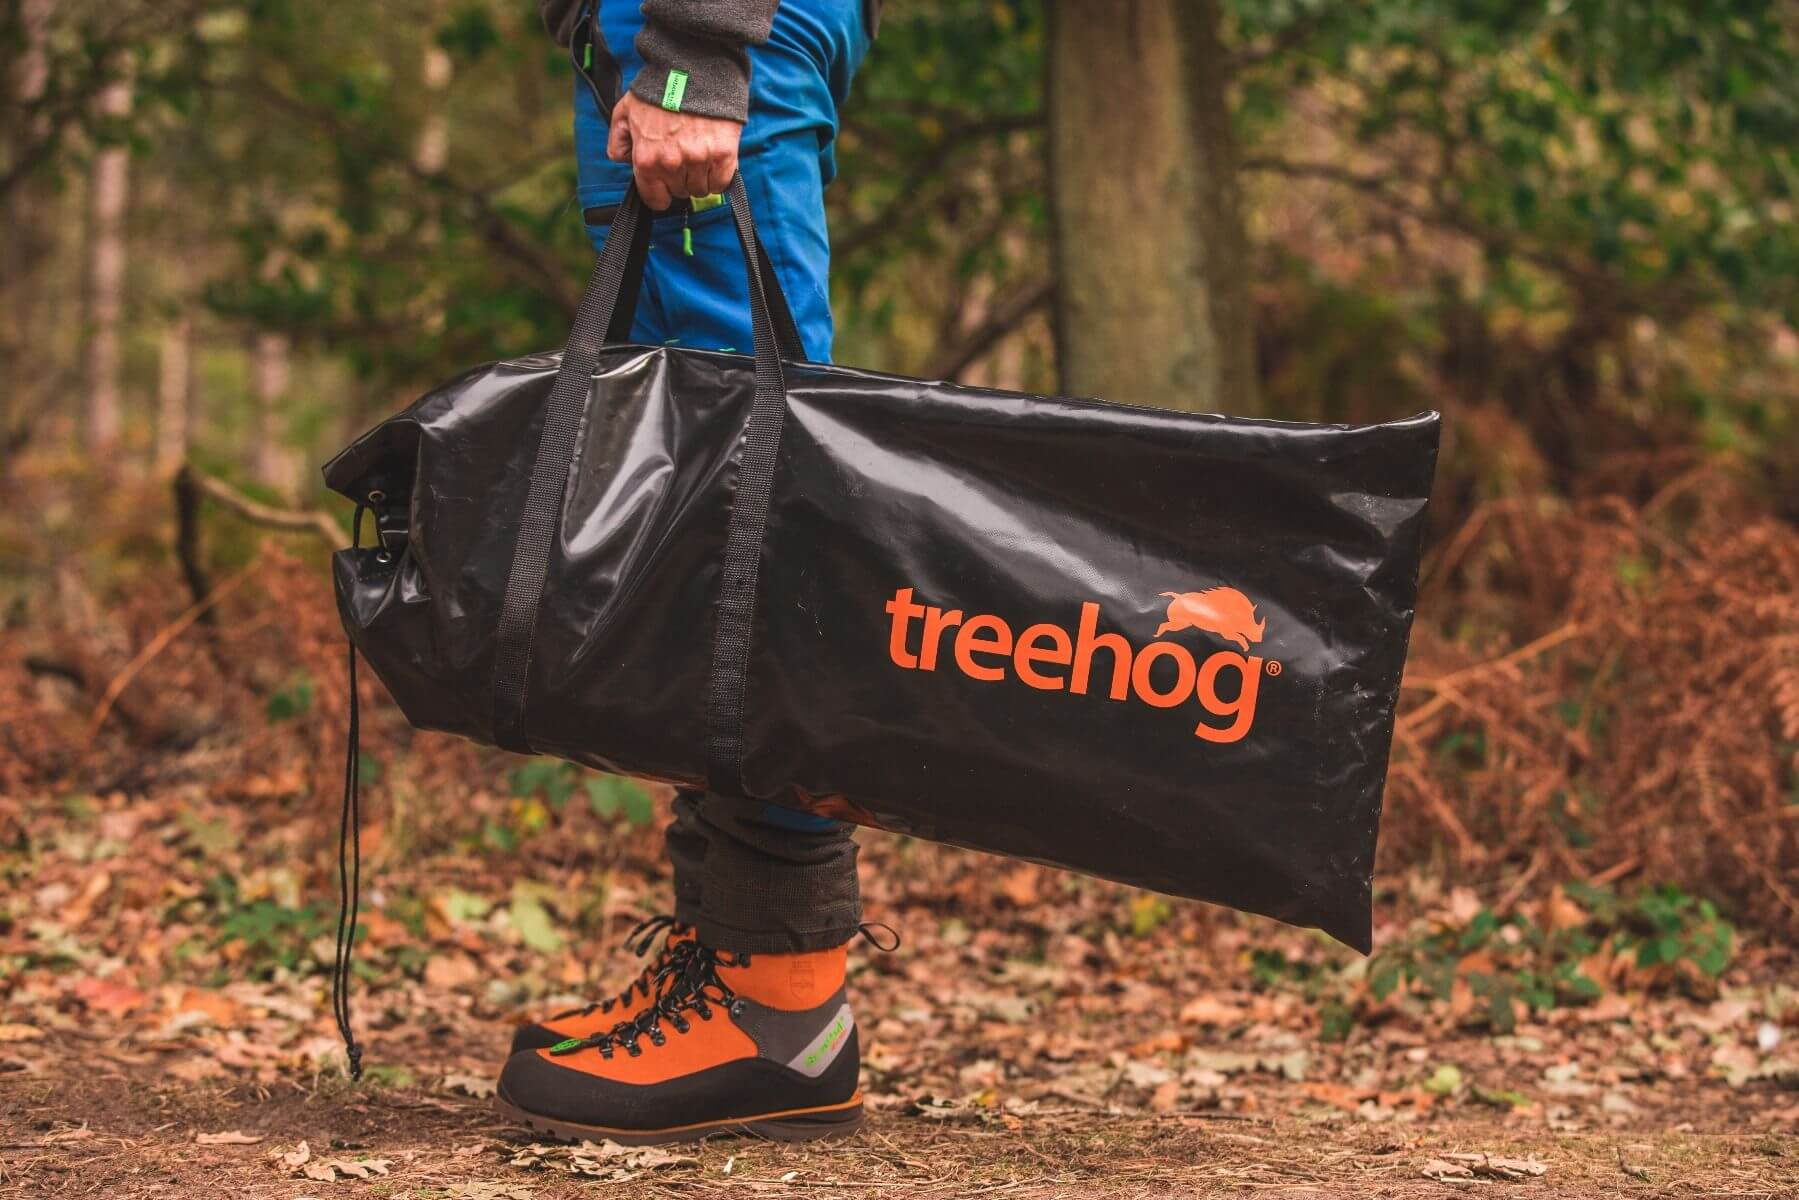 Treehog Mesh Guard System